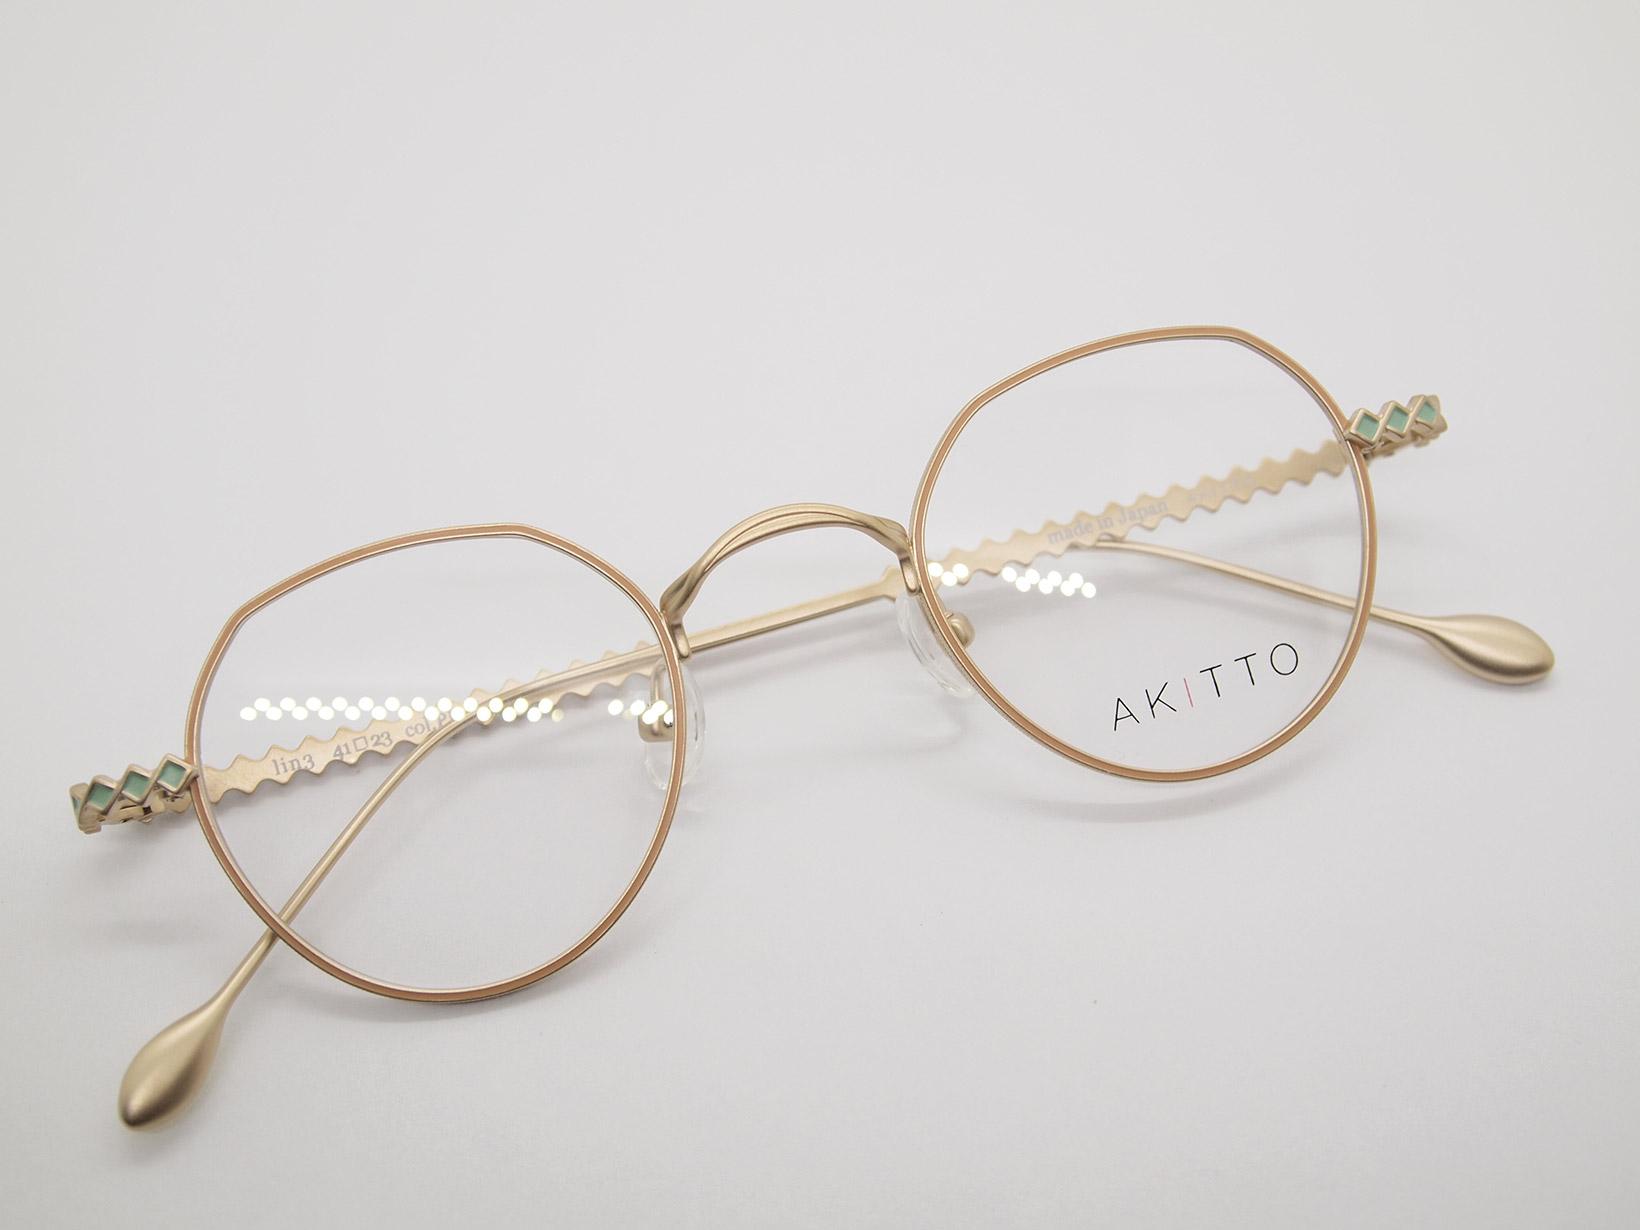 AKITTO 2021-4th lin3 color PK size:41□23 material:titanium+enamel price:¥48,950-(税込み)